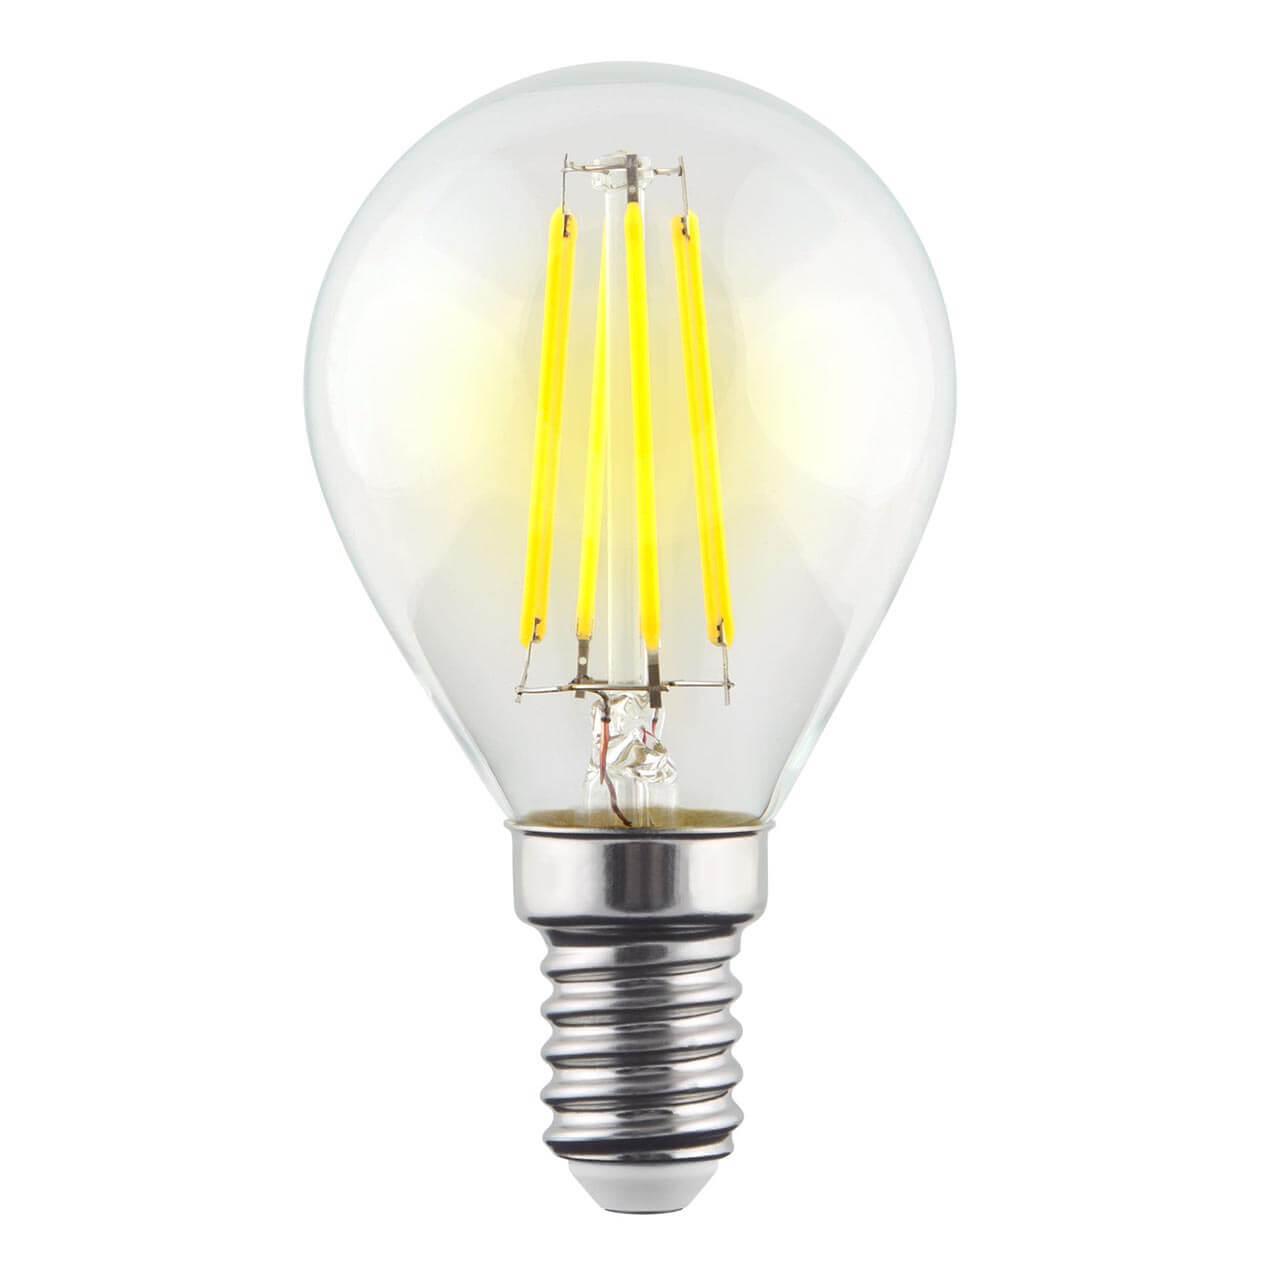 Лампа светодиодная филаментная Voltega E14 9W 4000К прозрачная VG10-G1E14cold9W-F 7099 ретро лампа 5928 voltega